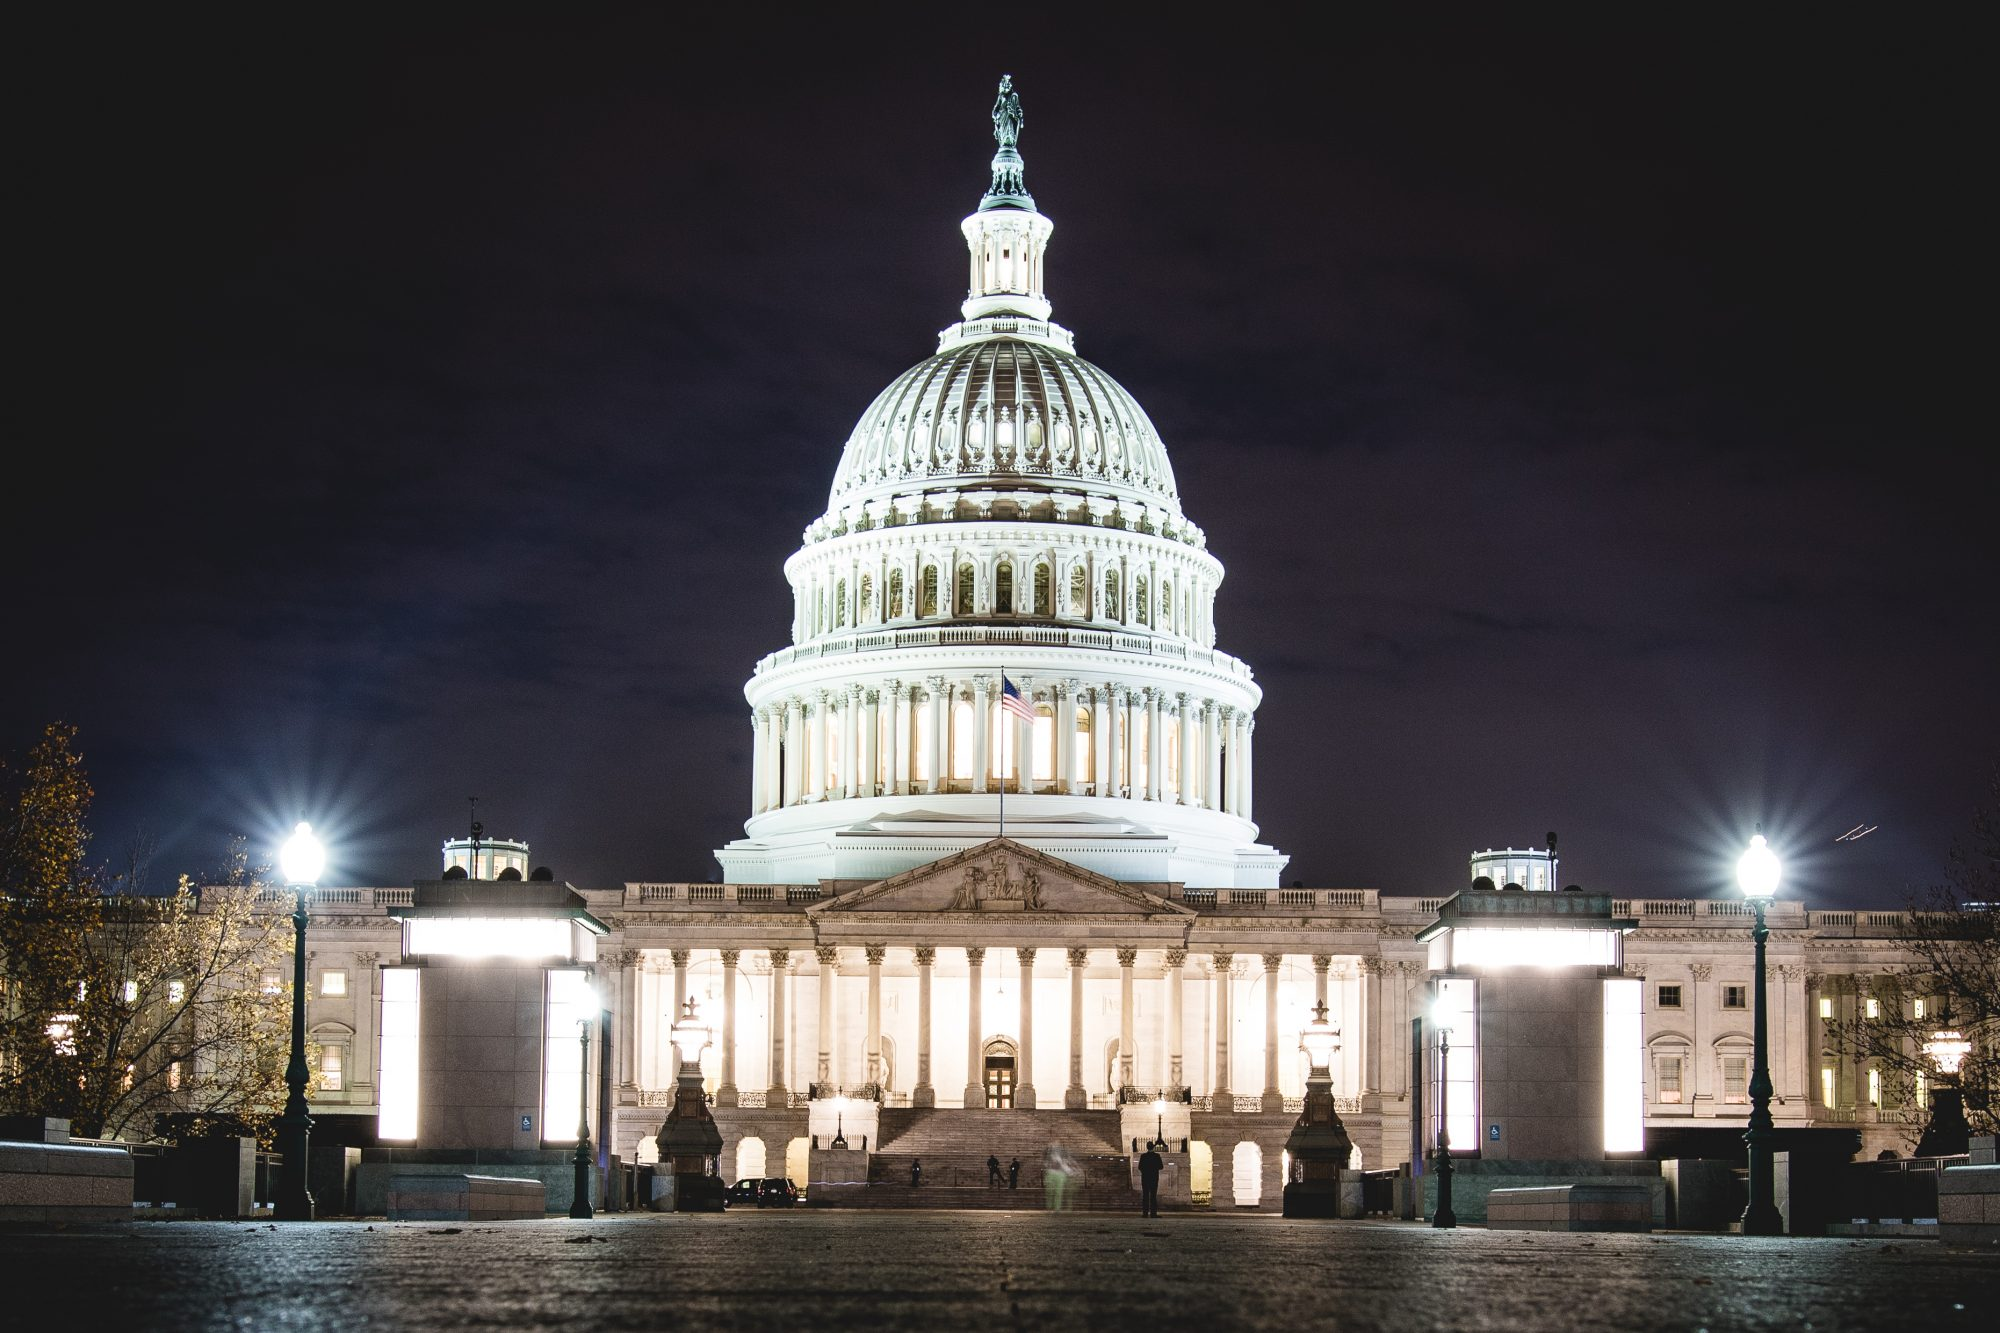 United States Capitol in Washington, D. C.